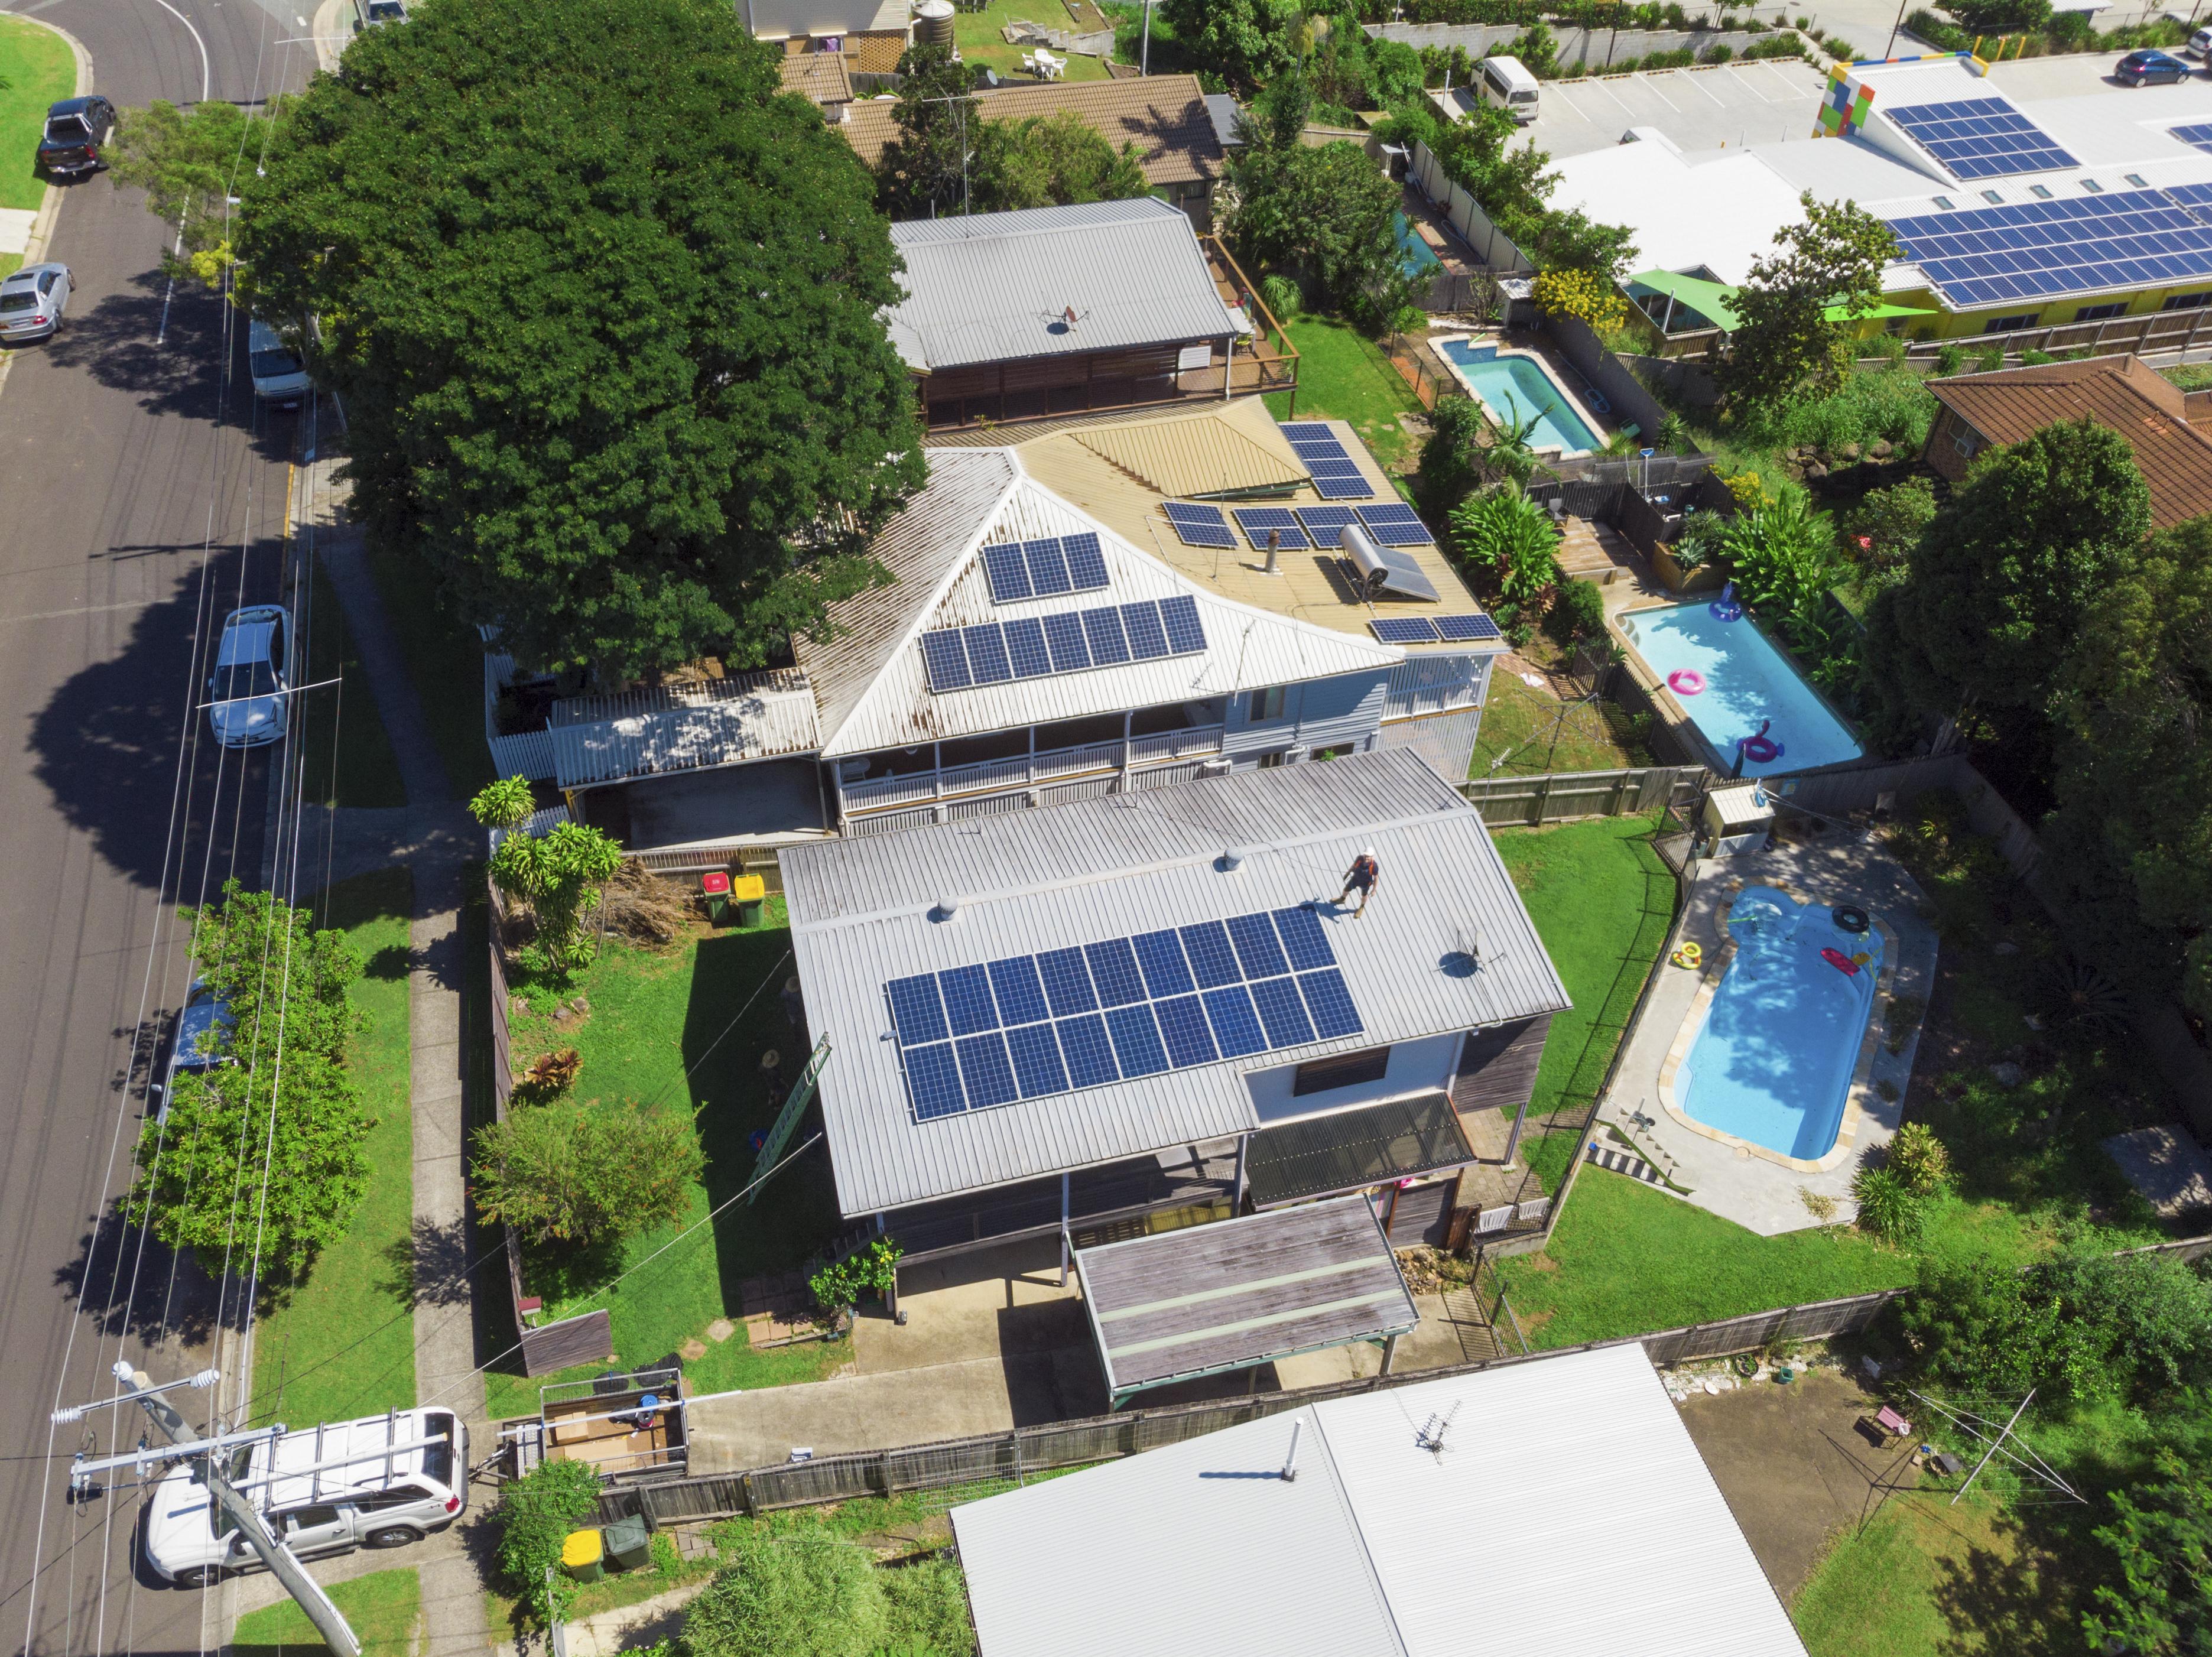 Aerial shot of solar panel technician installing solar panels on roof